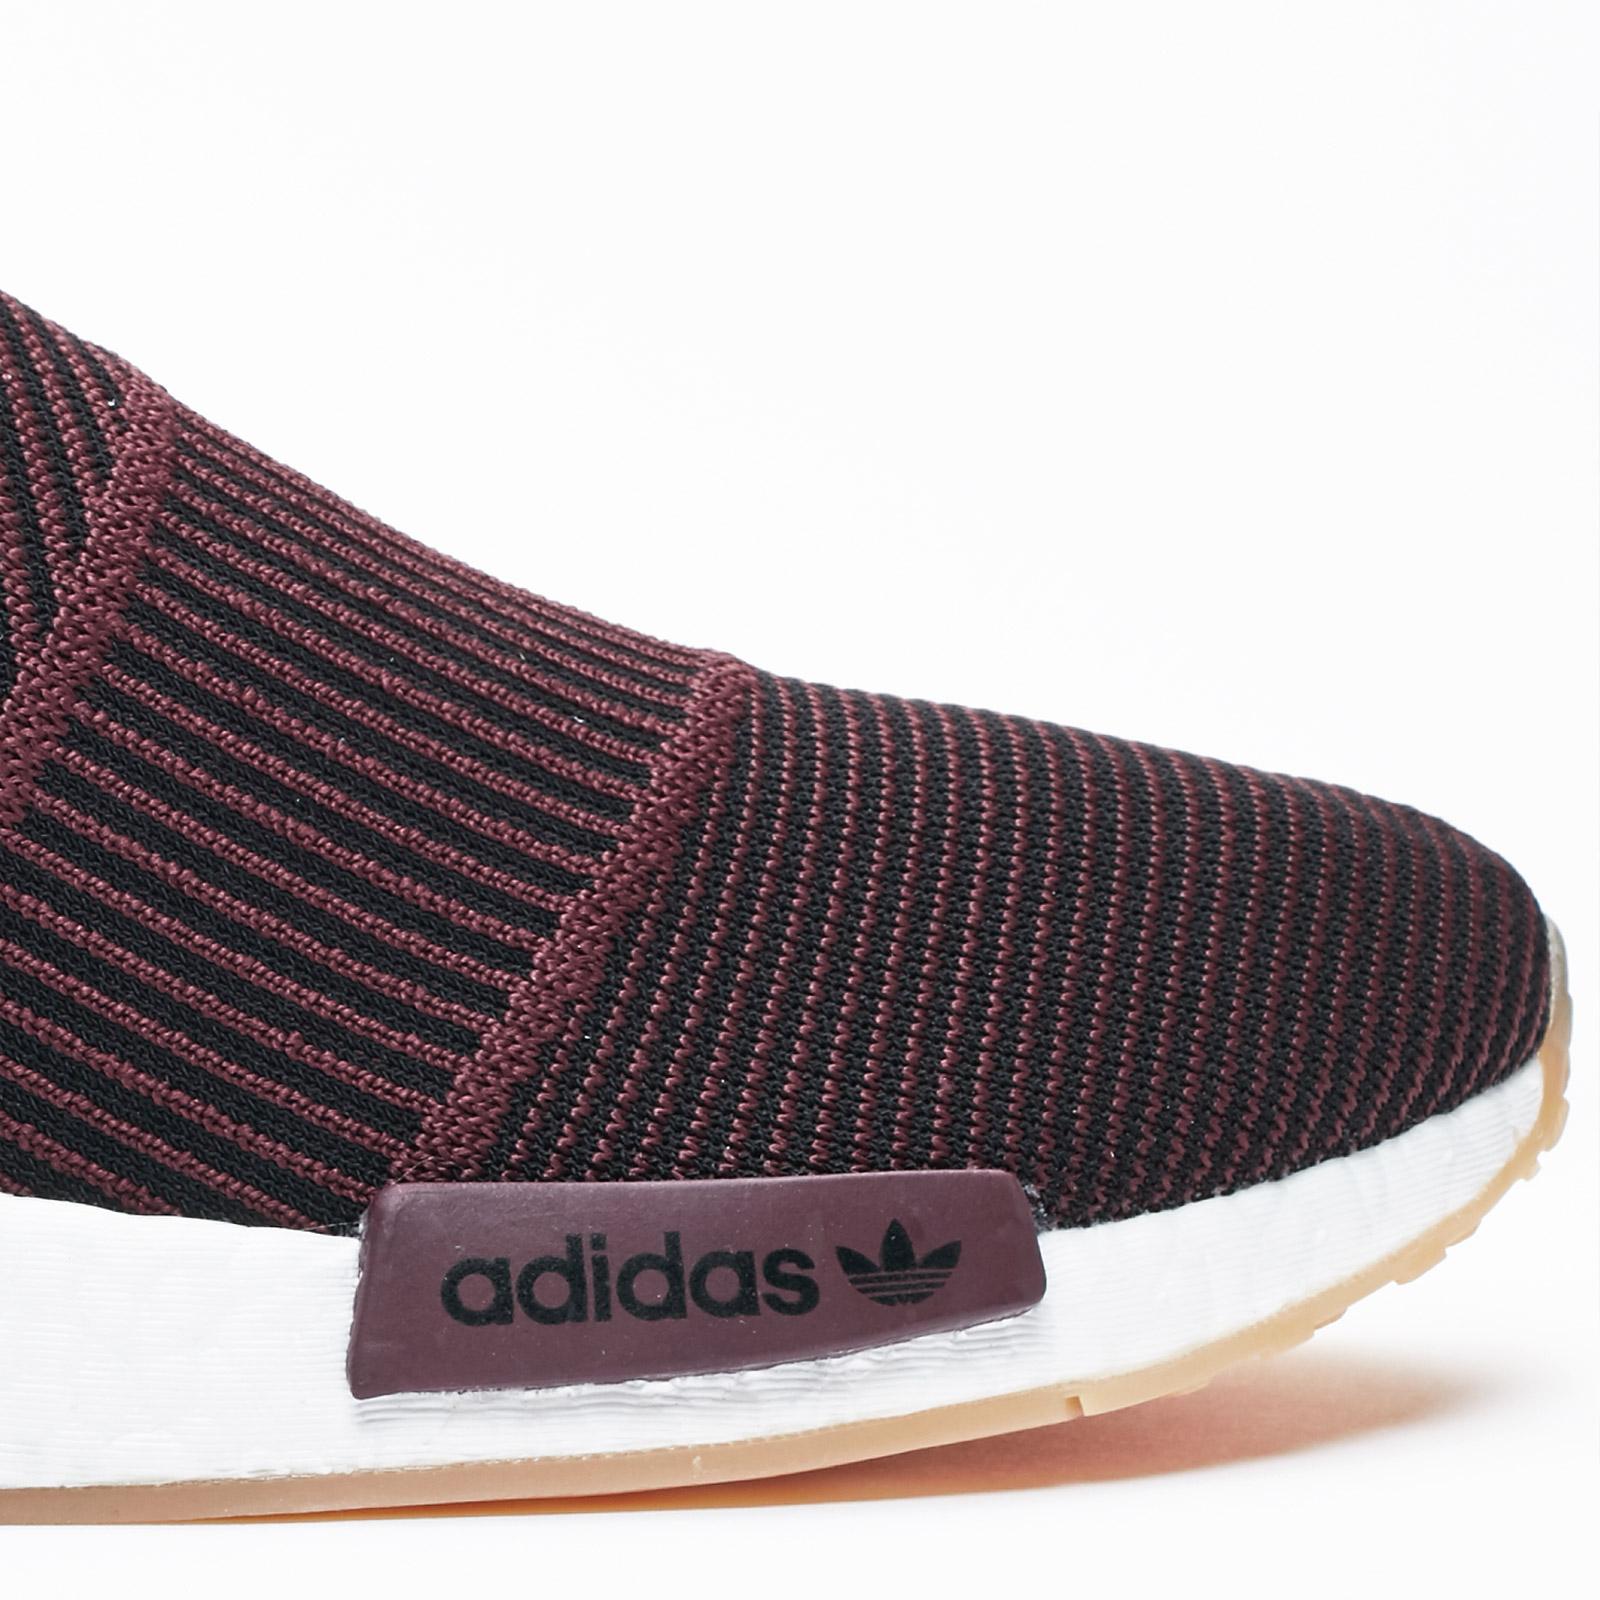 on sale b92f3 6a57b adidas Originals NMD CS1 GORE-TEX Primeknit SNS Exclusive - 7. Close.  Previous Next